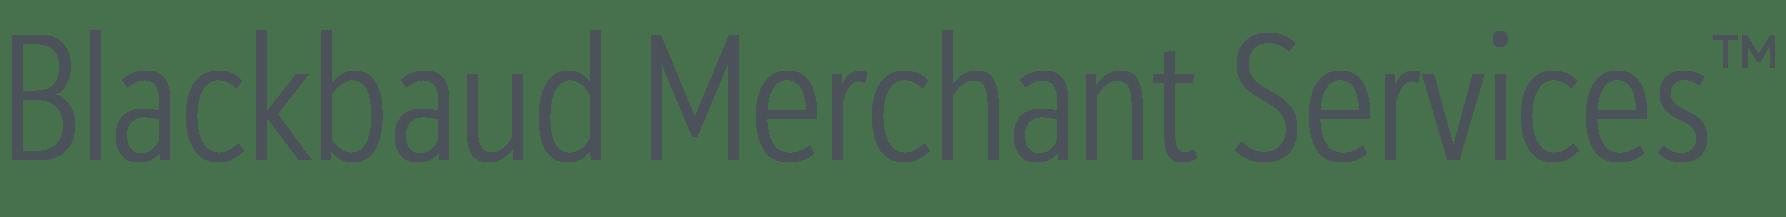 Blackbaud Merchant Services Gray